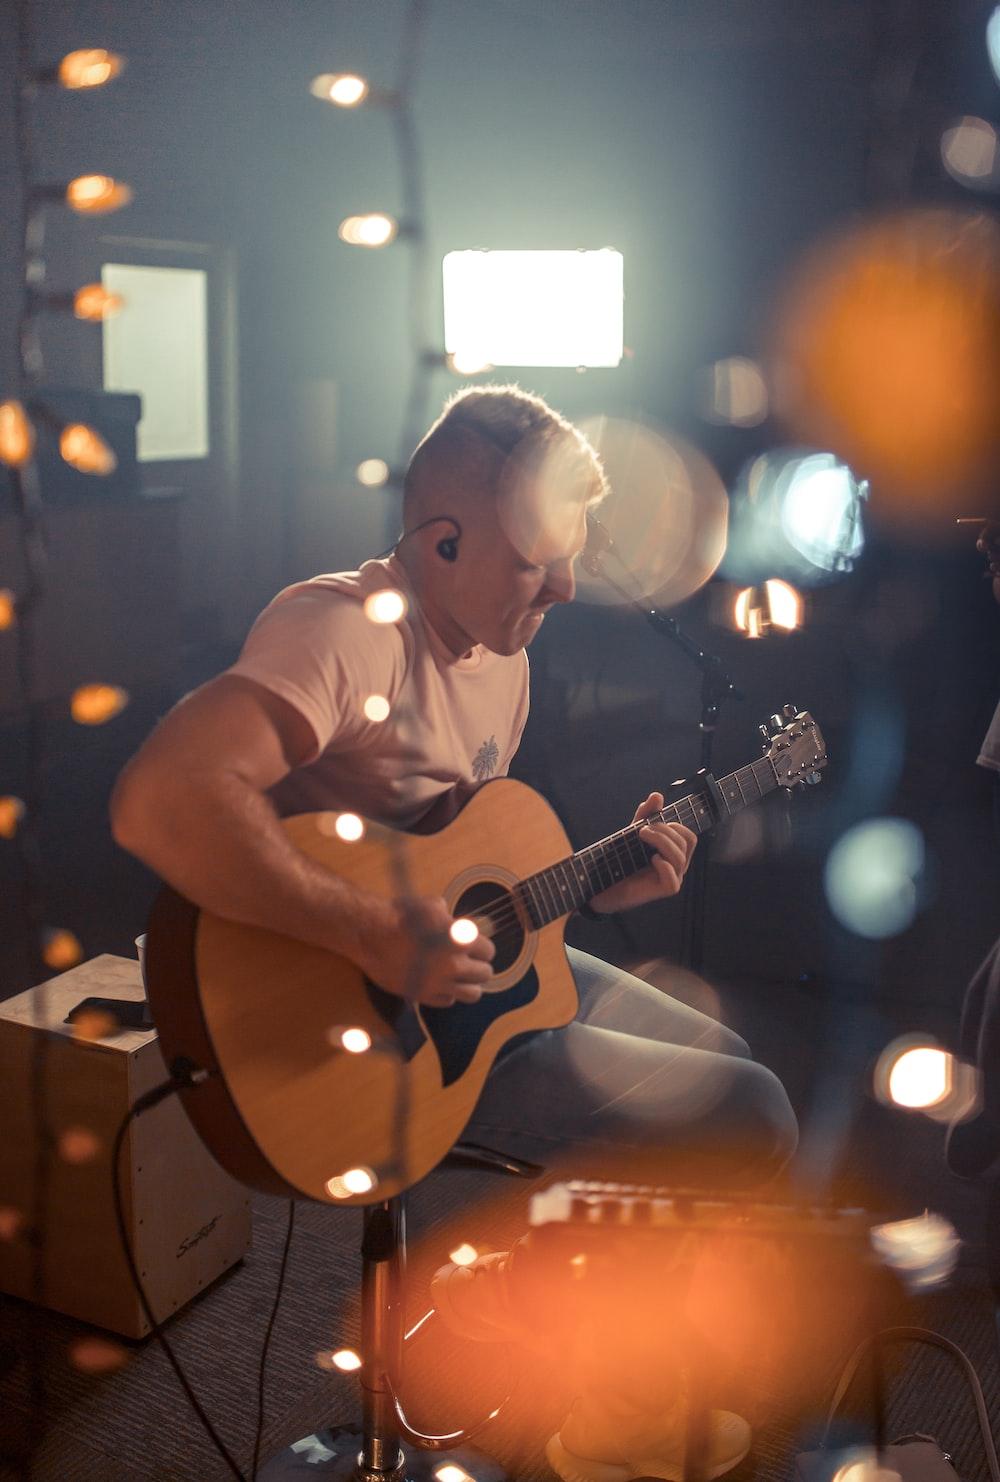 bokeh photography of man playing guitar